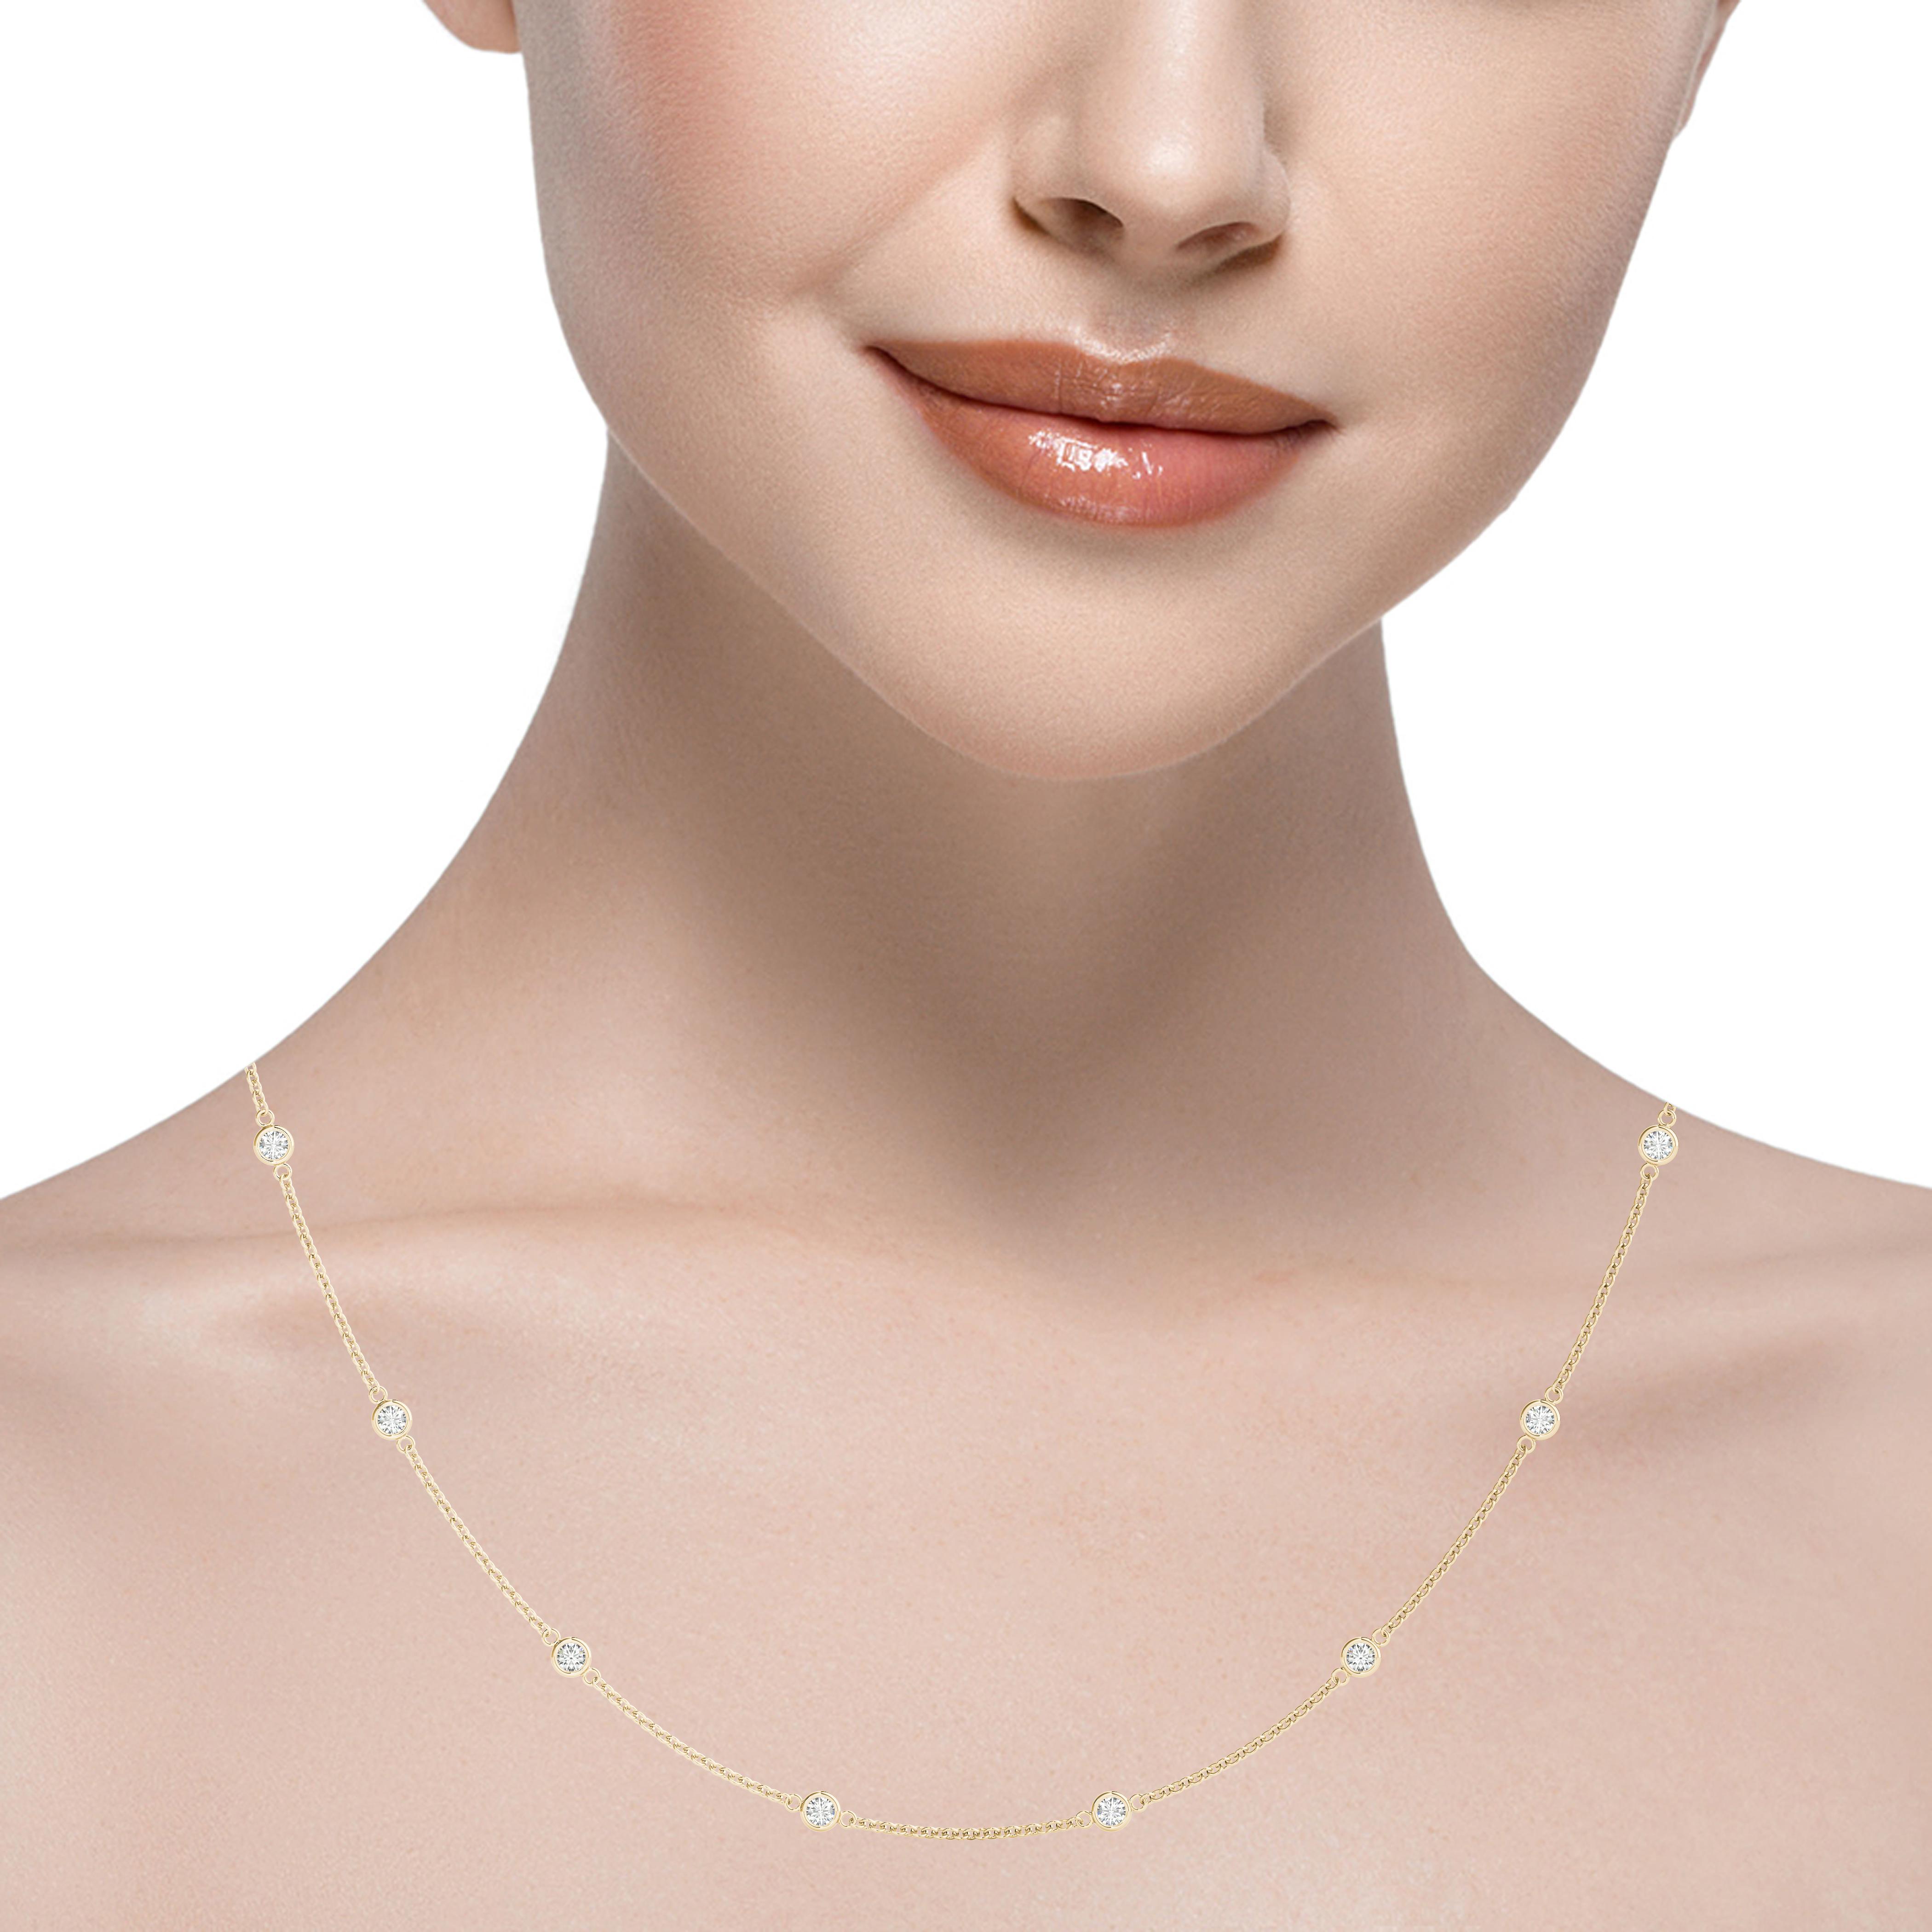 14k-yellow-gold-chain-diamond-necklace-60026-1